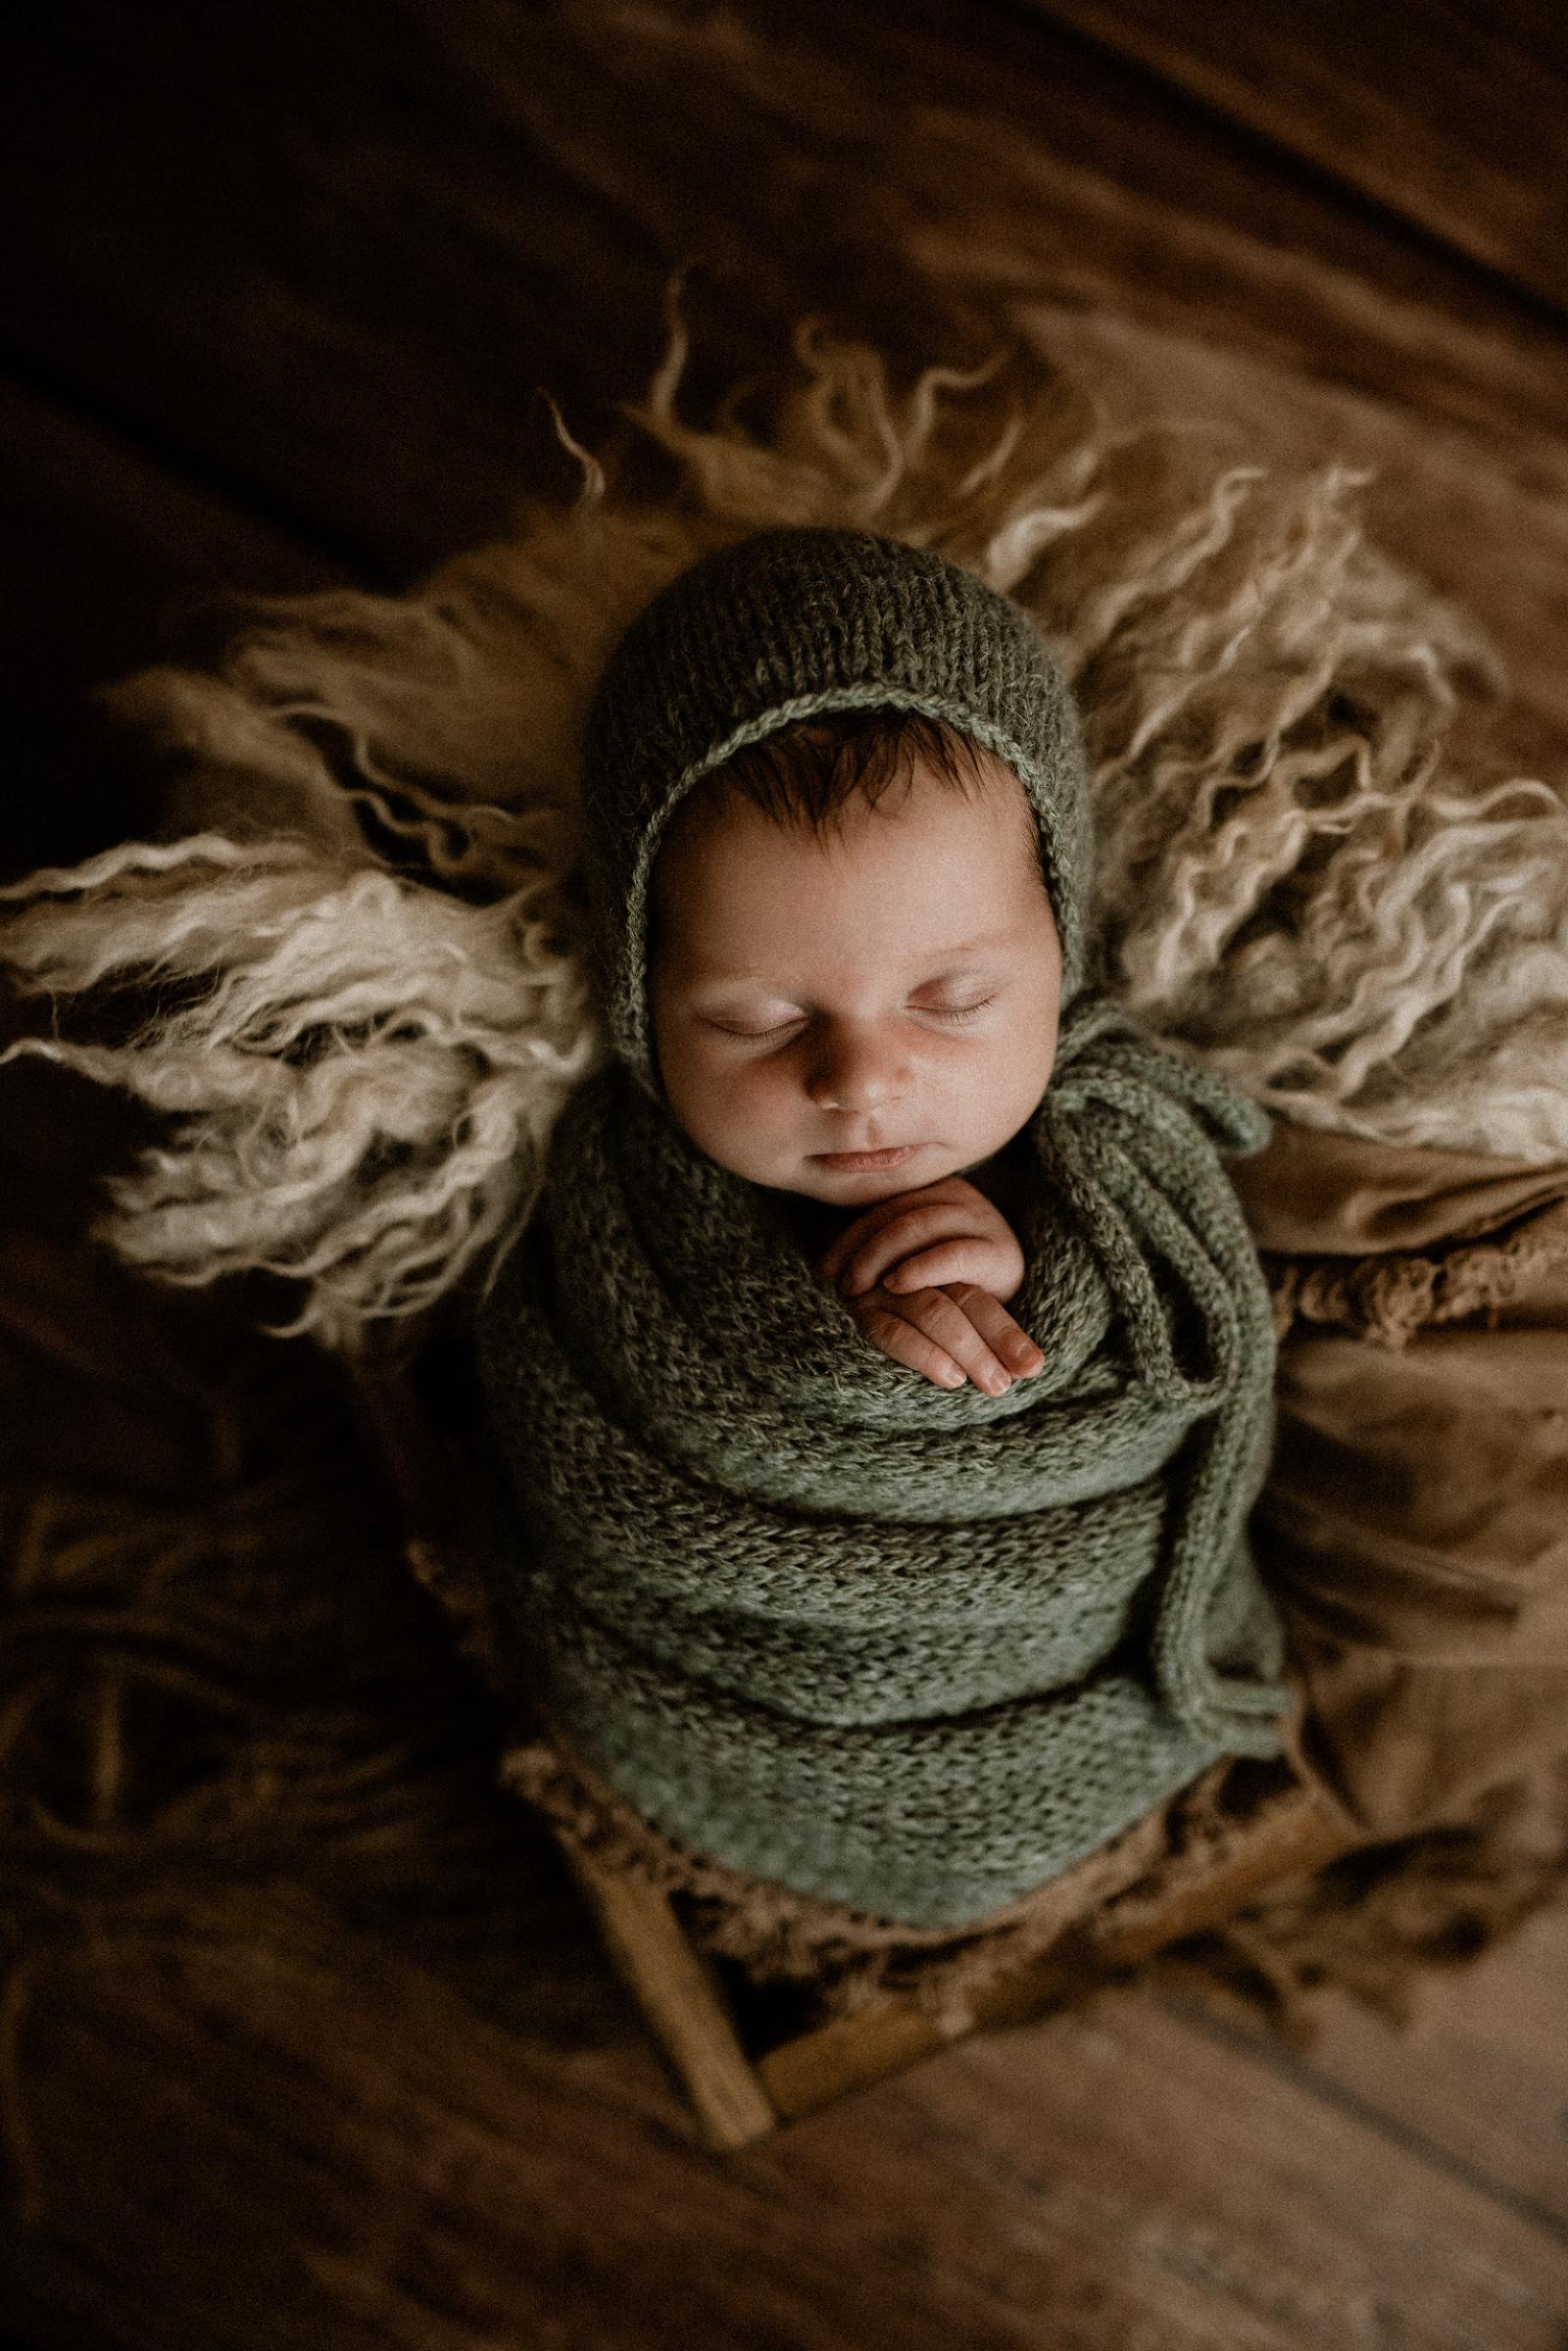 photographe nouveau né naissance angoulême